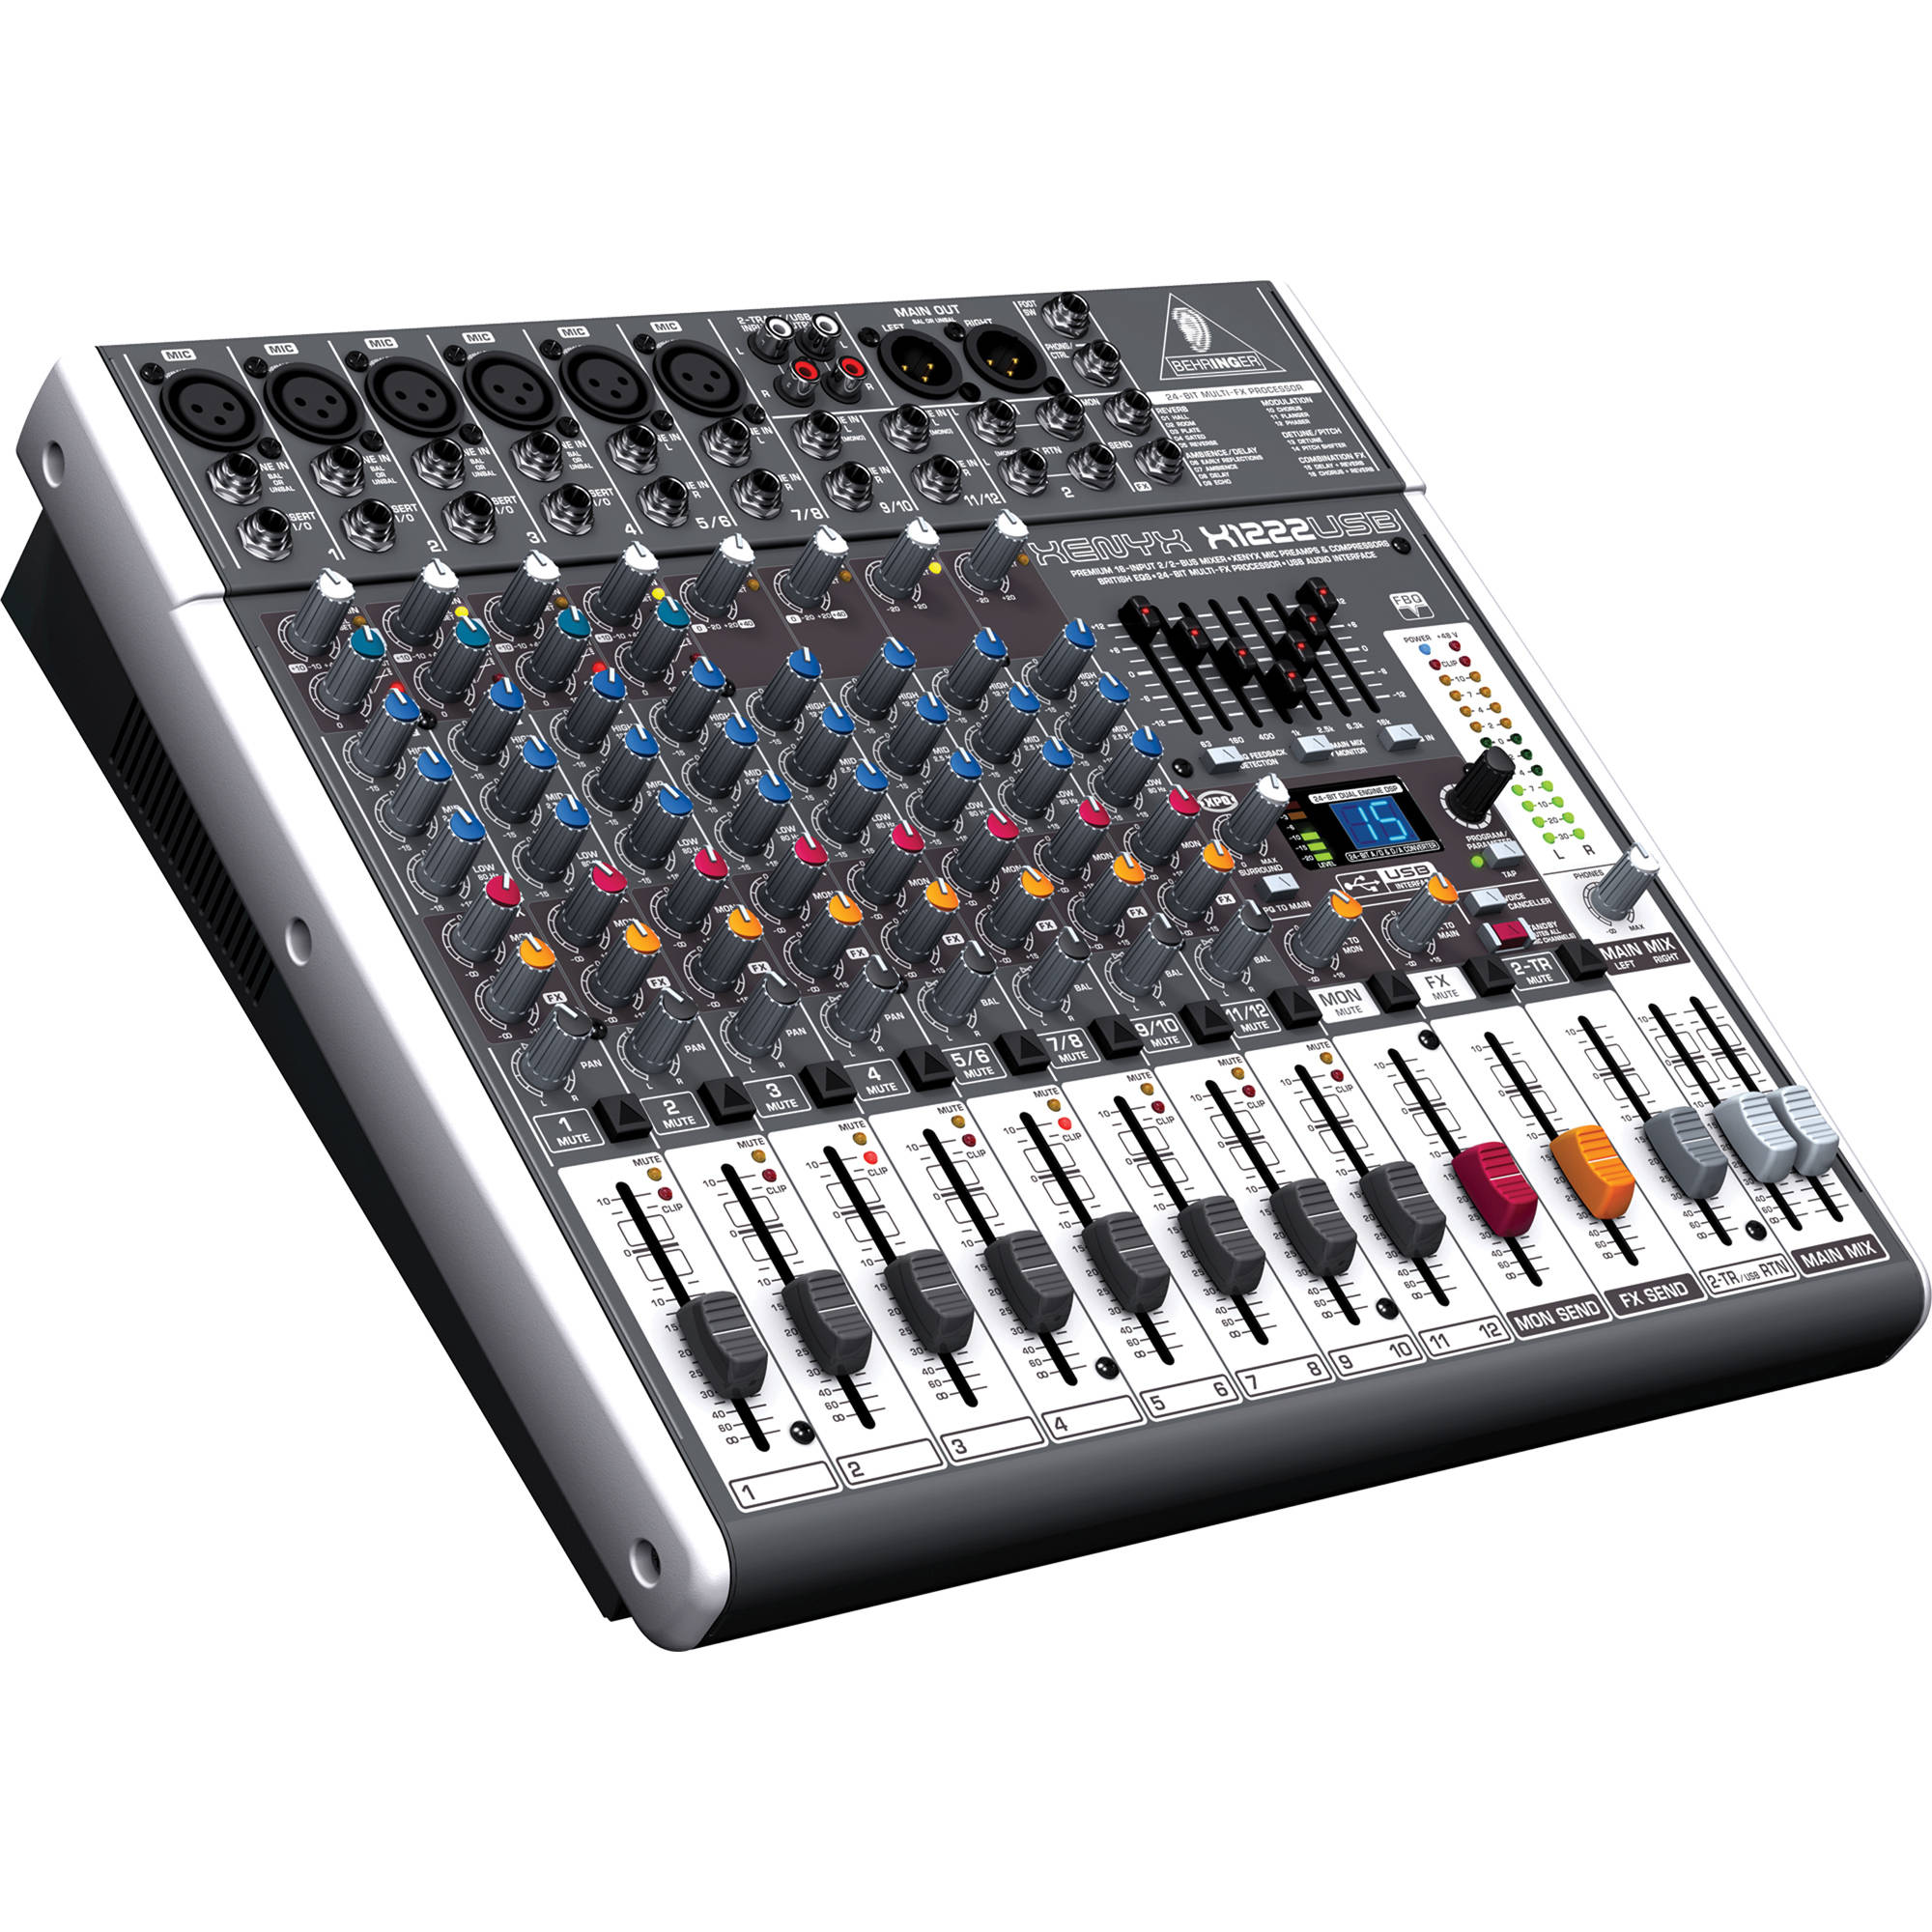 Harga Audio Mixer Audio Mixer With Effects